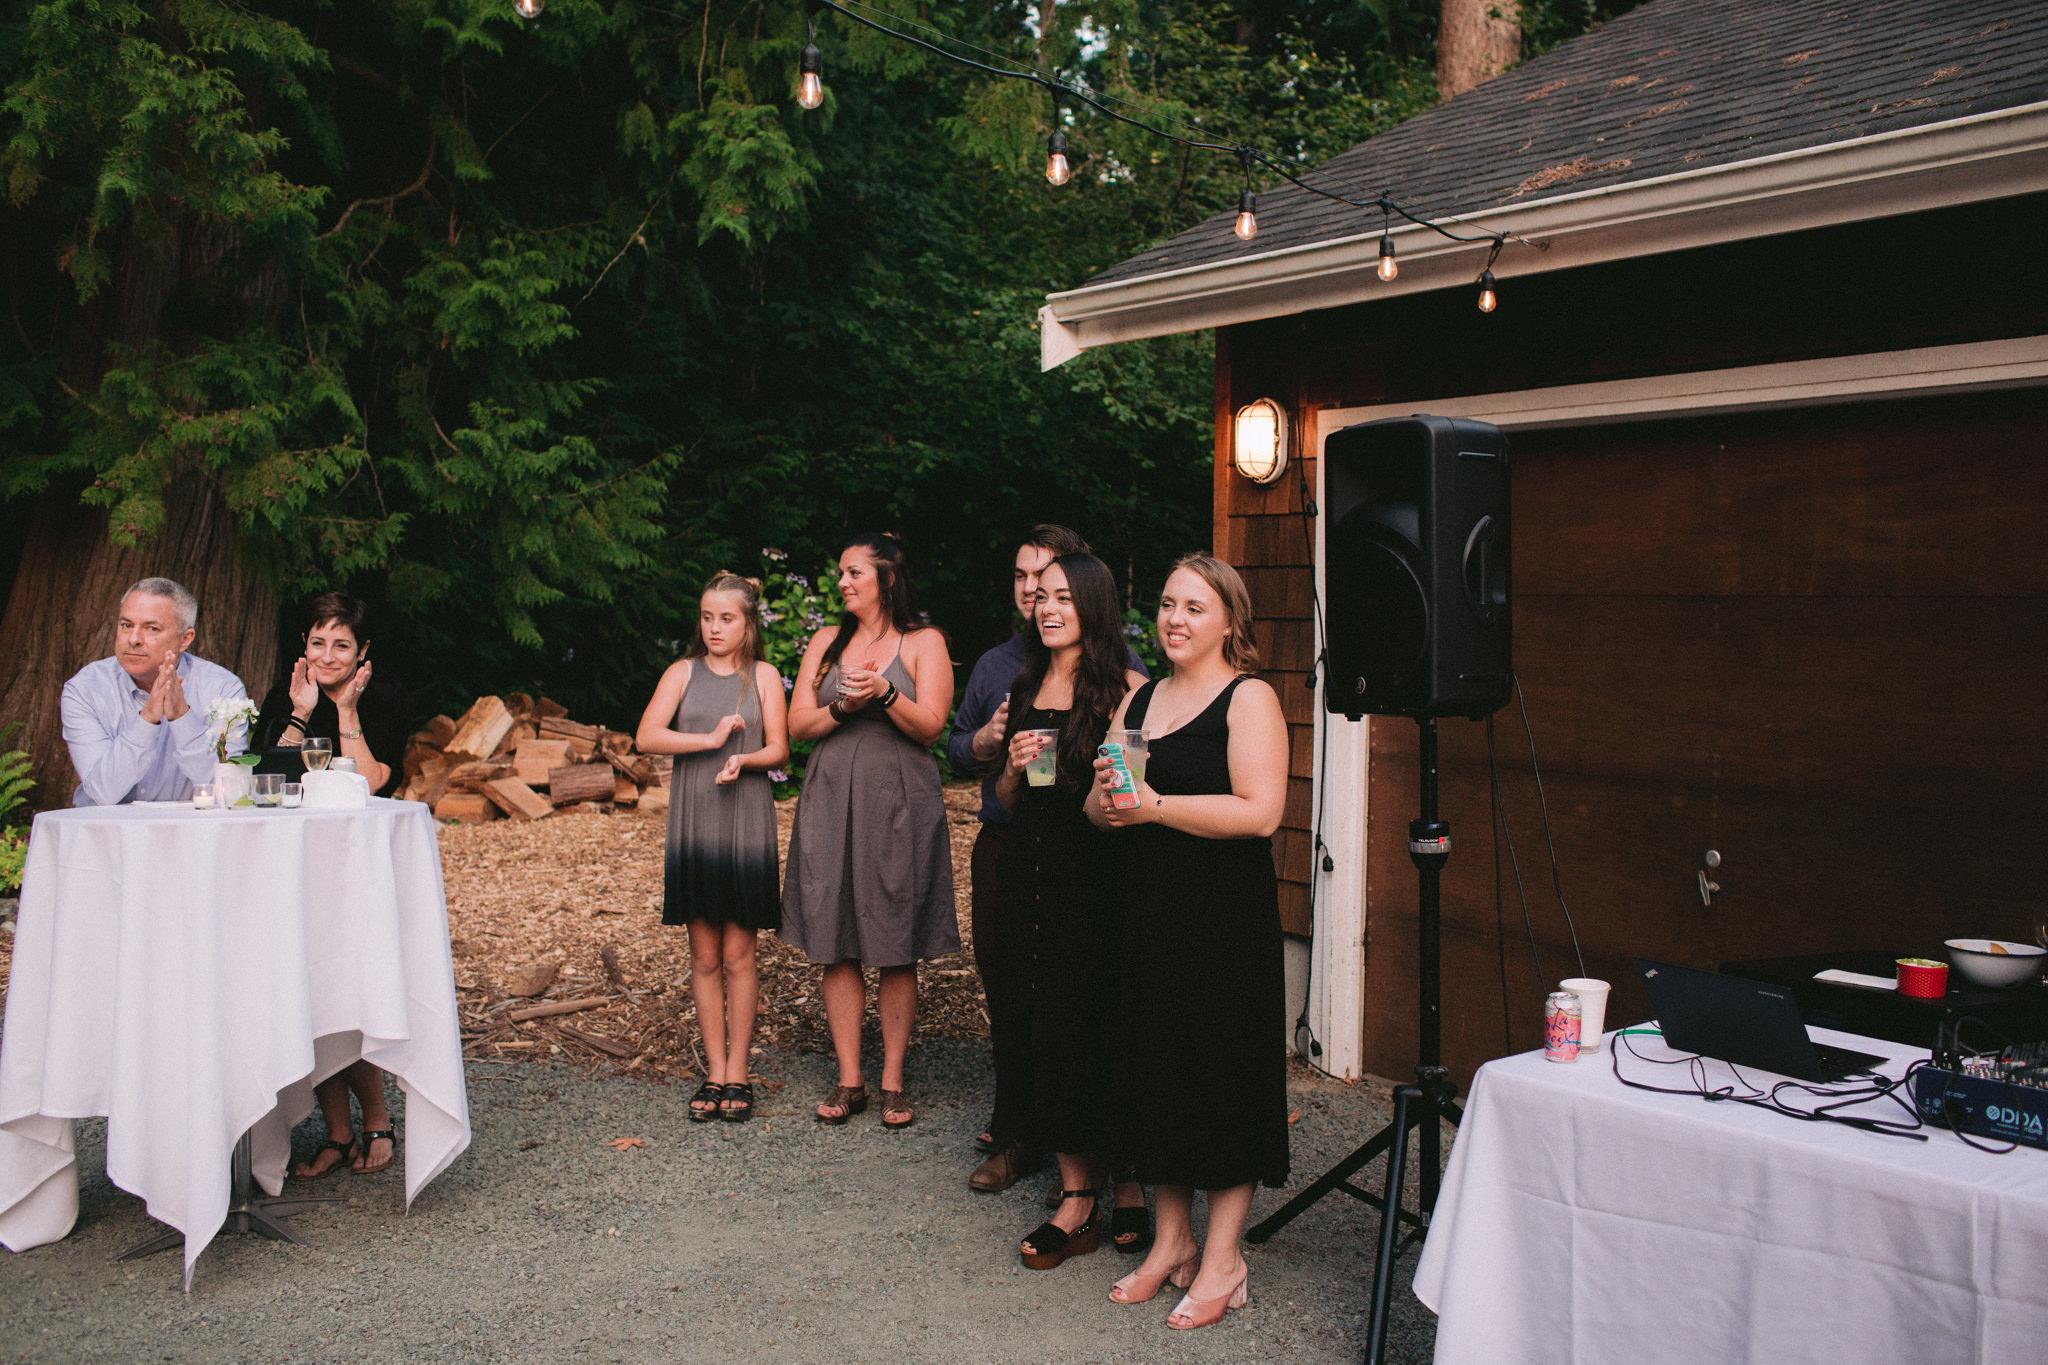 Backyard-Bainbridge-Island-Wedding-Alycia-Lovell-Photography-192.JPG